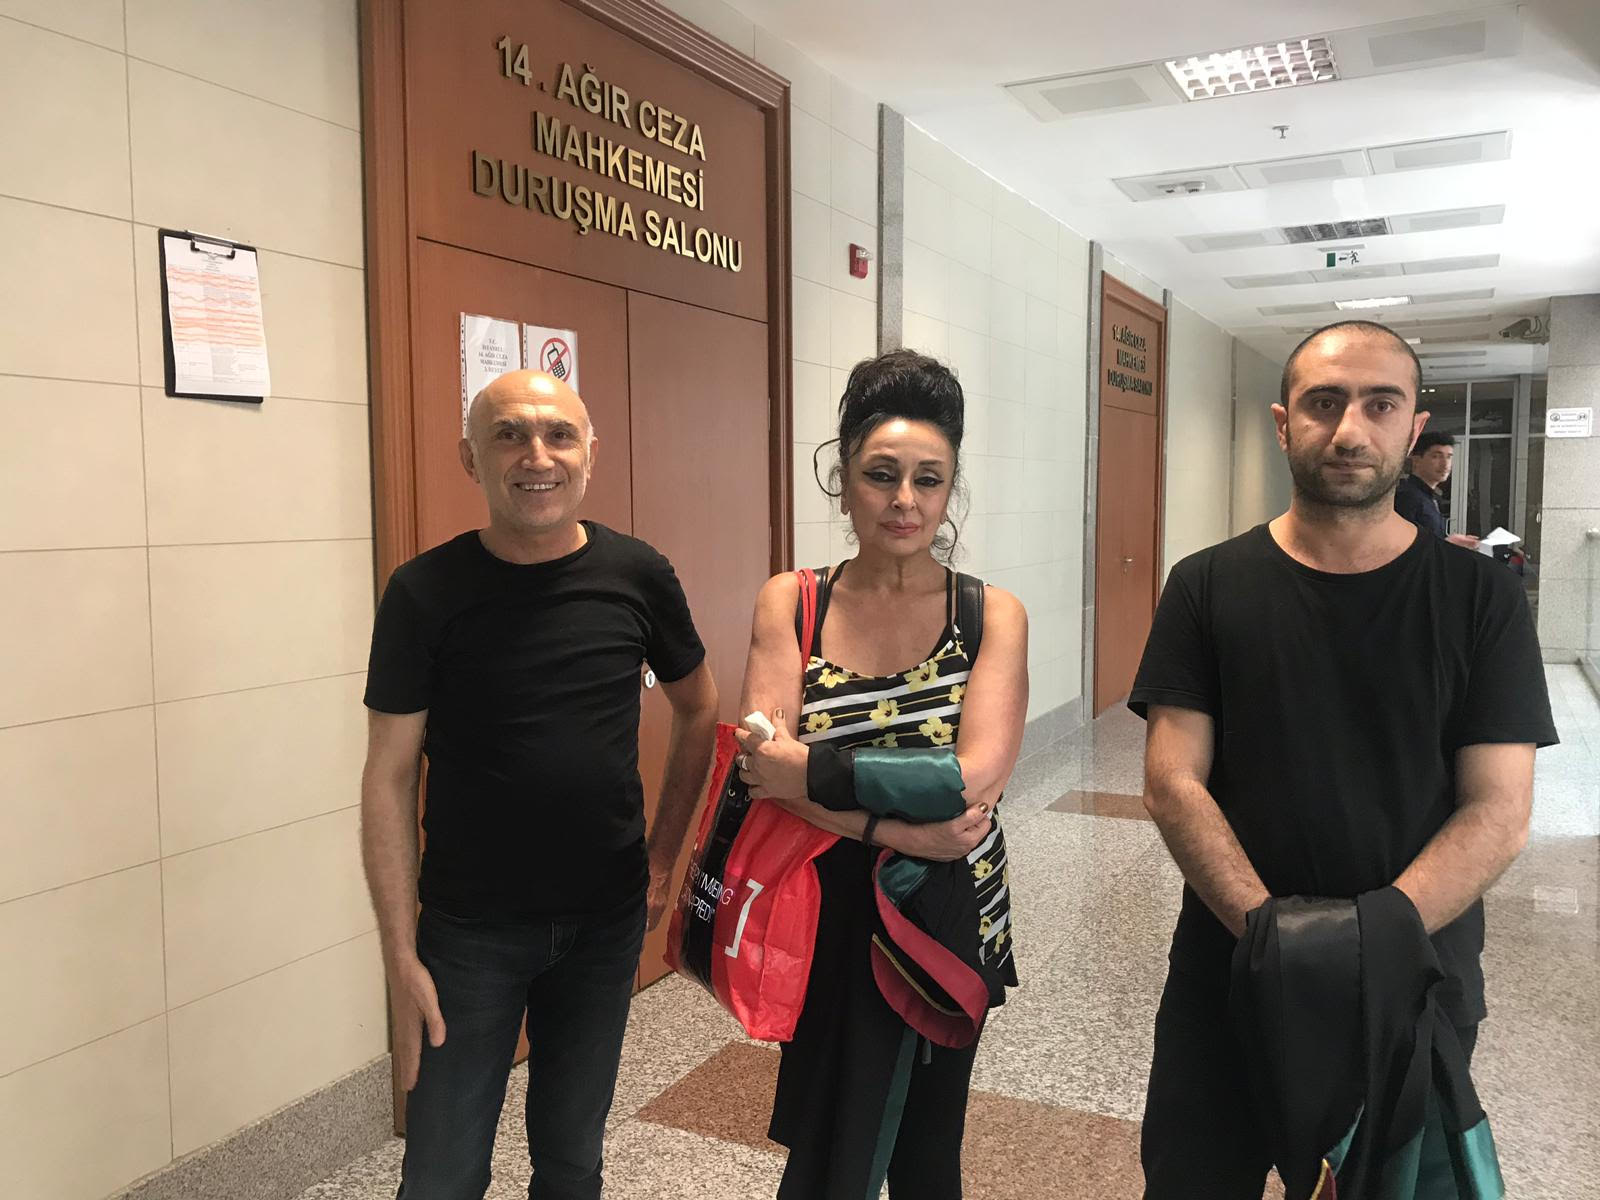 Court convicts 7 defendants in Özgür Gündem trial